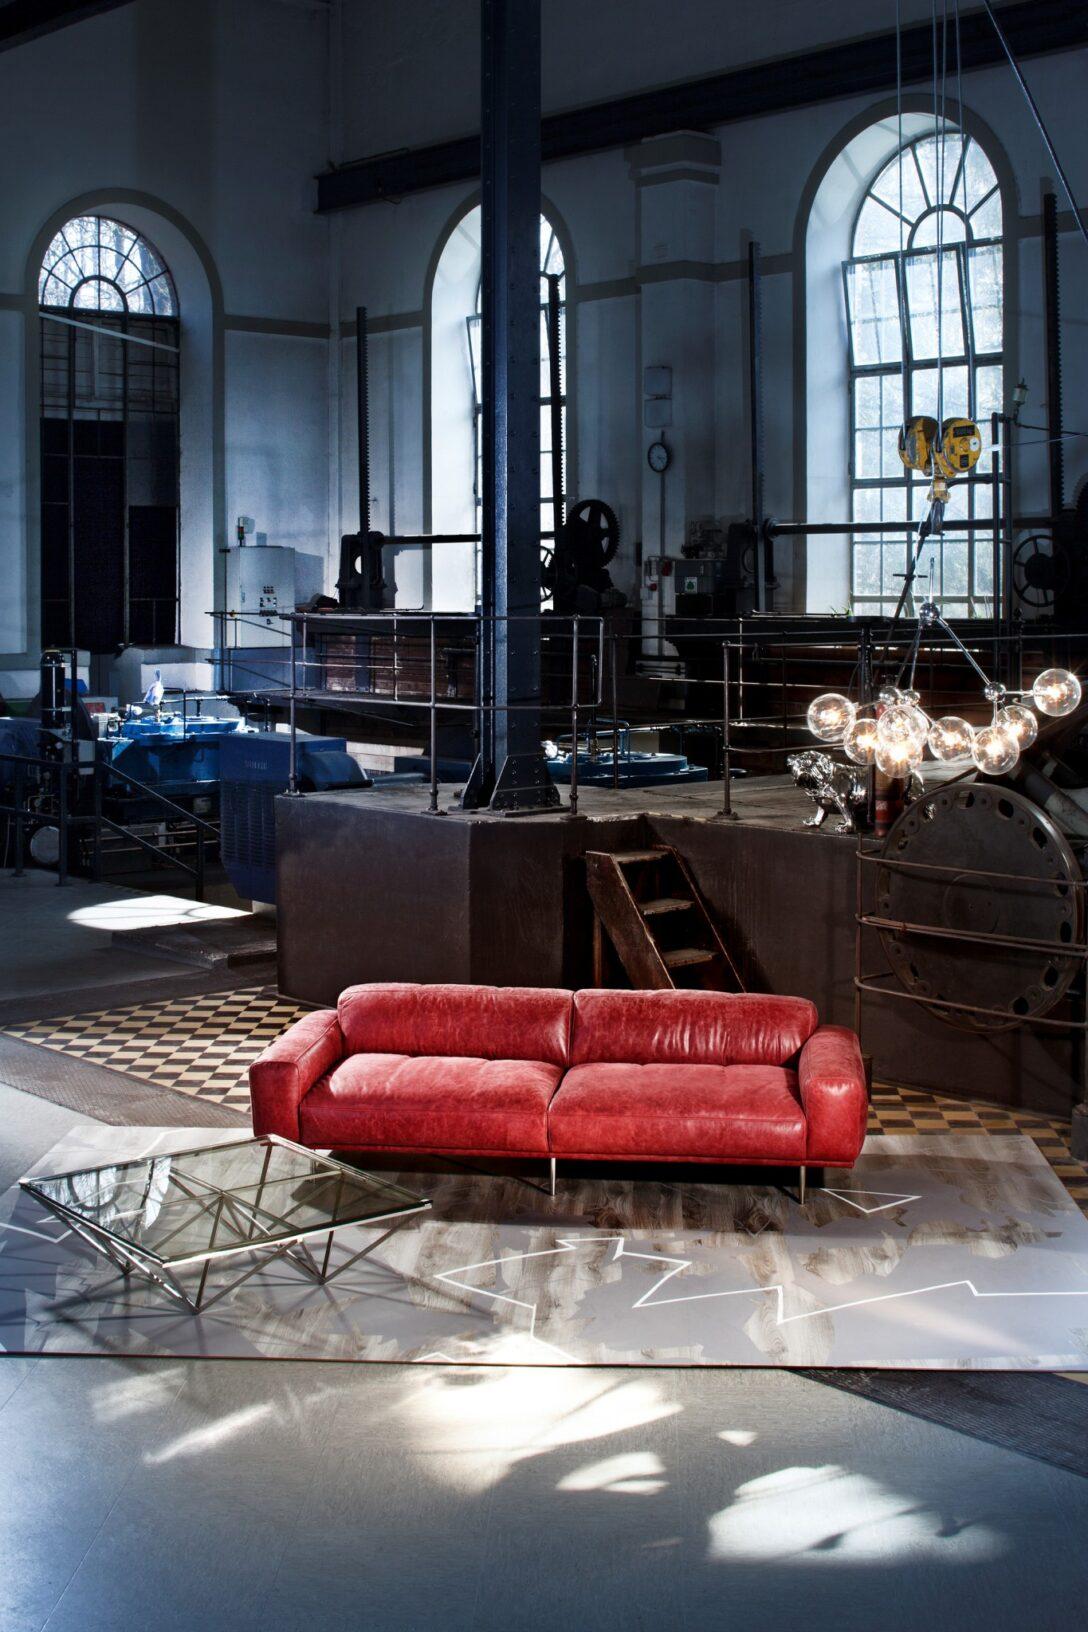 Large Size of Kare Sofa Couch Leder Samt Furniture Sales Bed Design Proud Infinity Gianni 1 Keyser Husse Mit Abnehmbaren Bezug Reinigen Patchwork Rund Weiches Abnehmbarer Sofa Kare Sofa